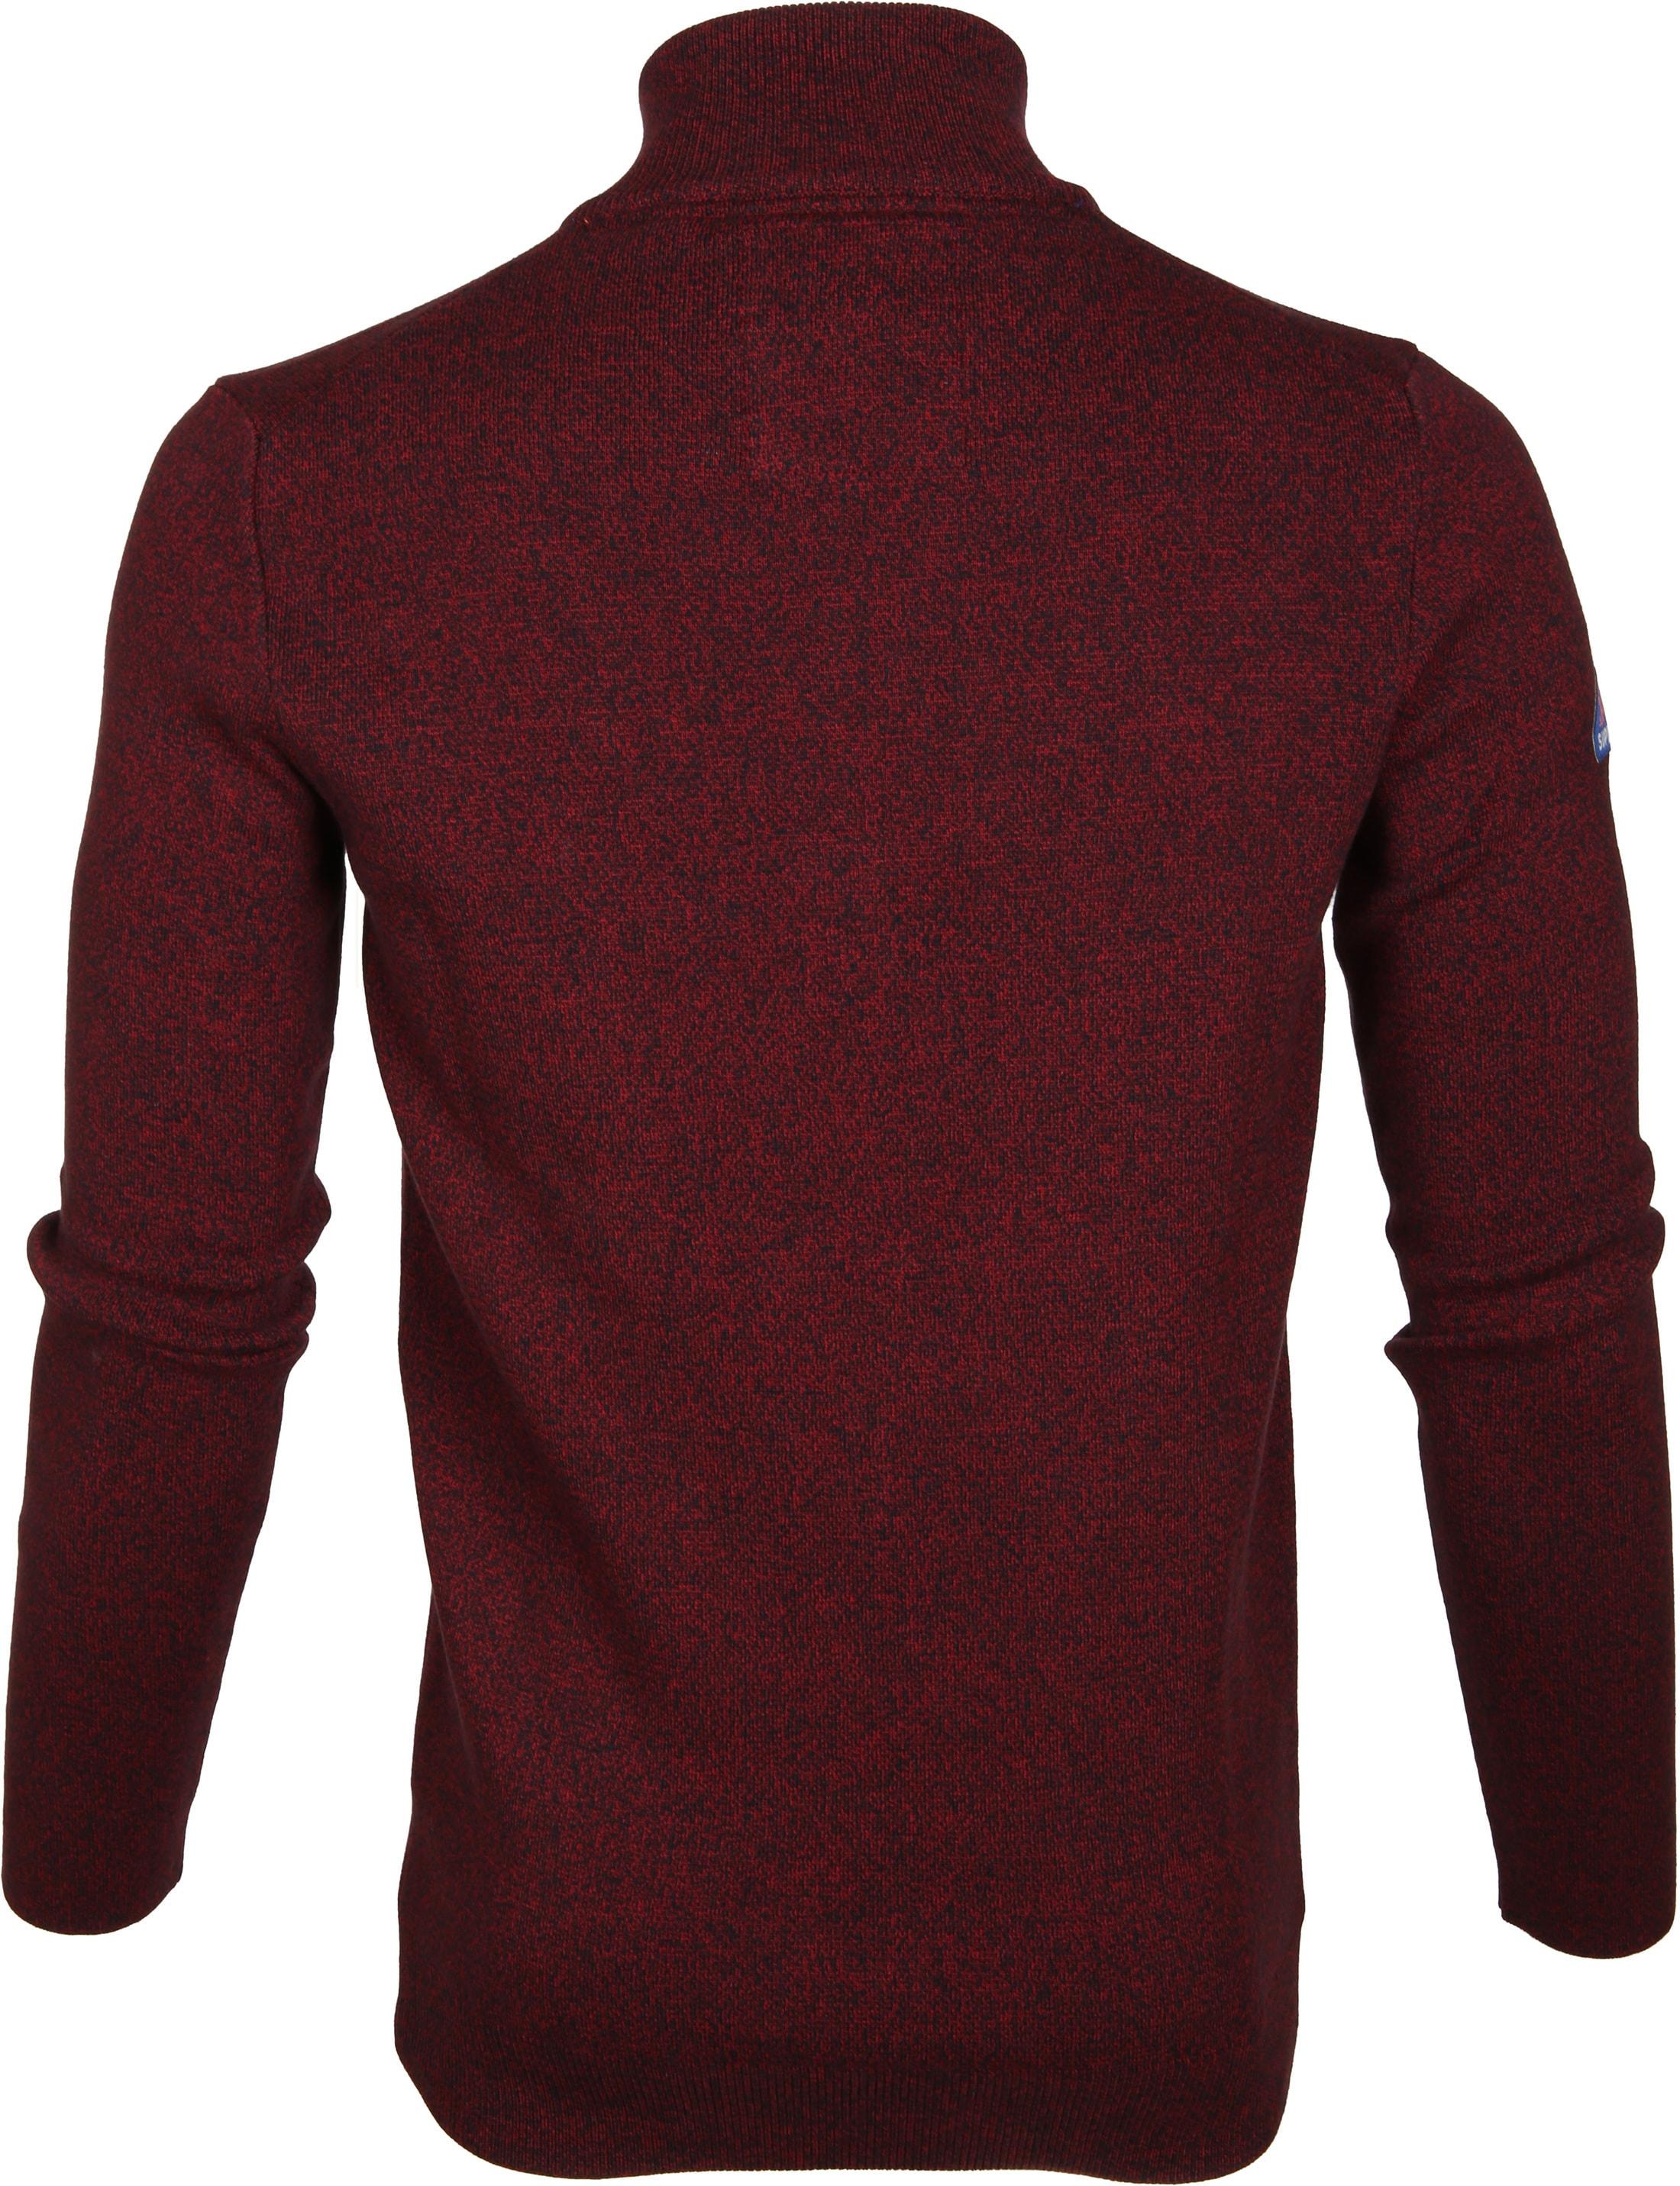 Superdry Sweater Melange Rood Rits foto 5